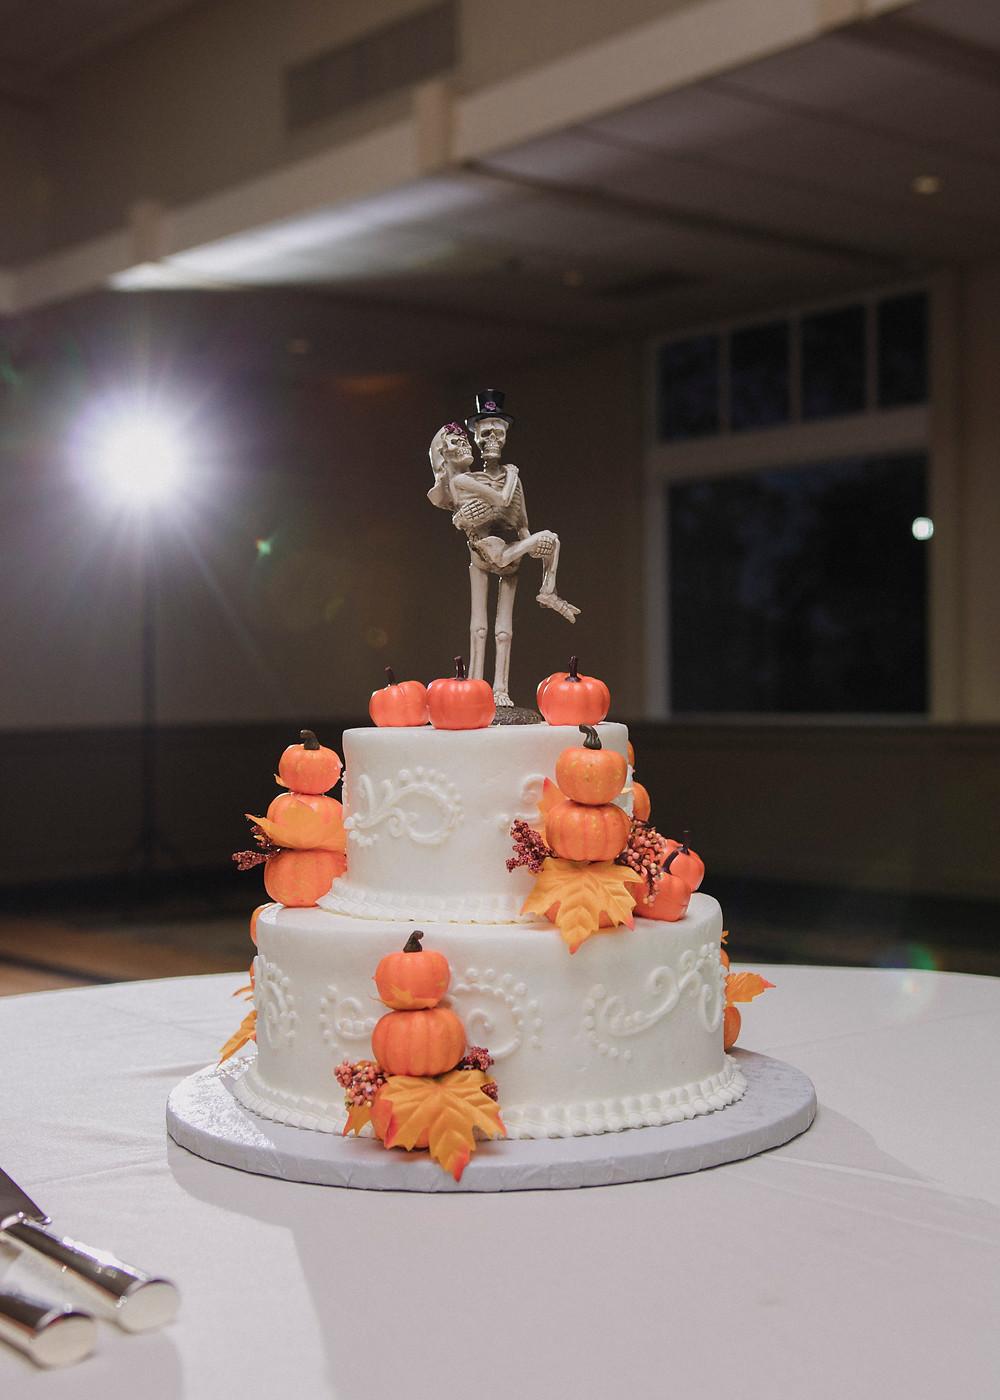 Pittsburgh Wedding Cakes - Pittsburgh Wedding Photographer | Wild North Weddings